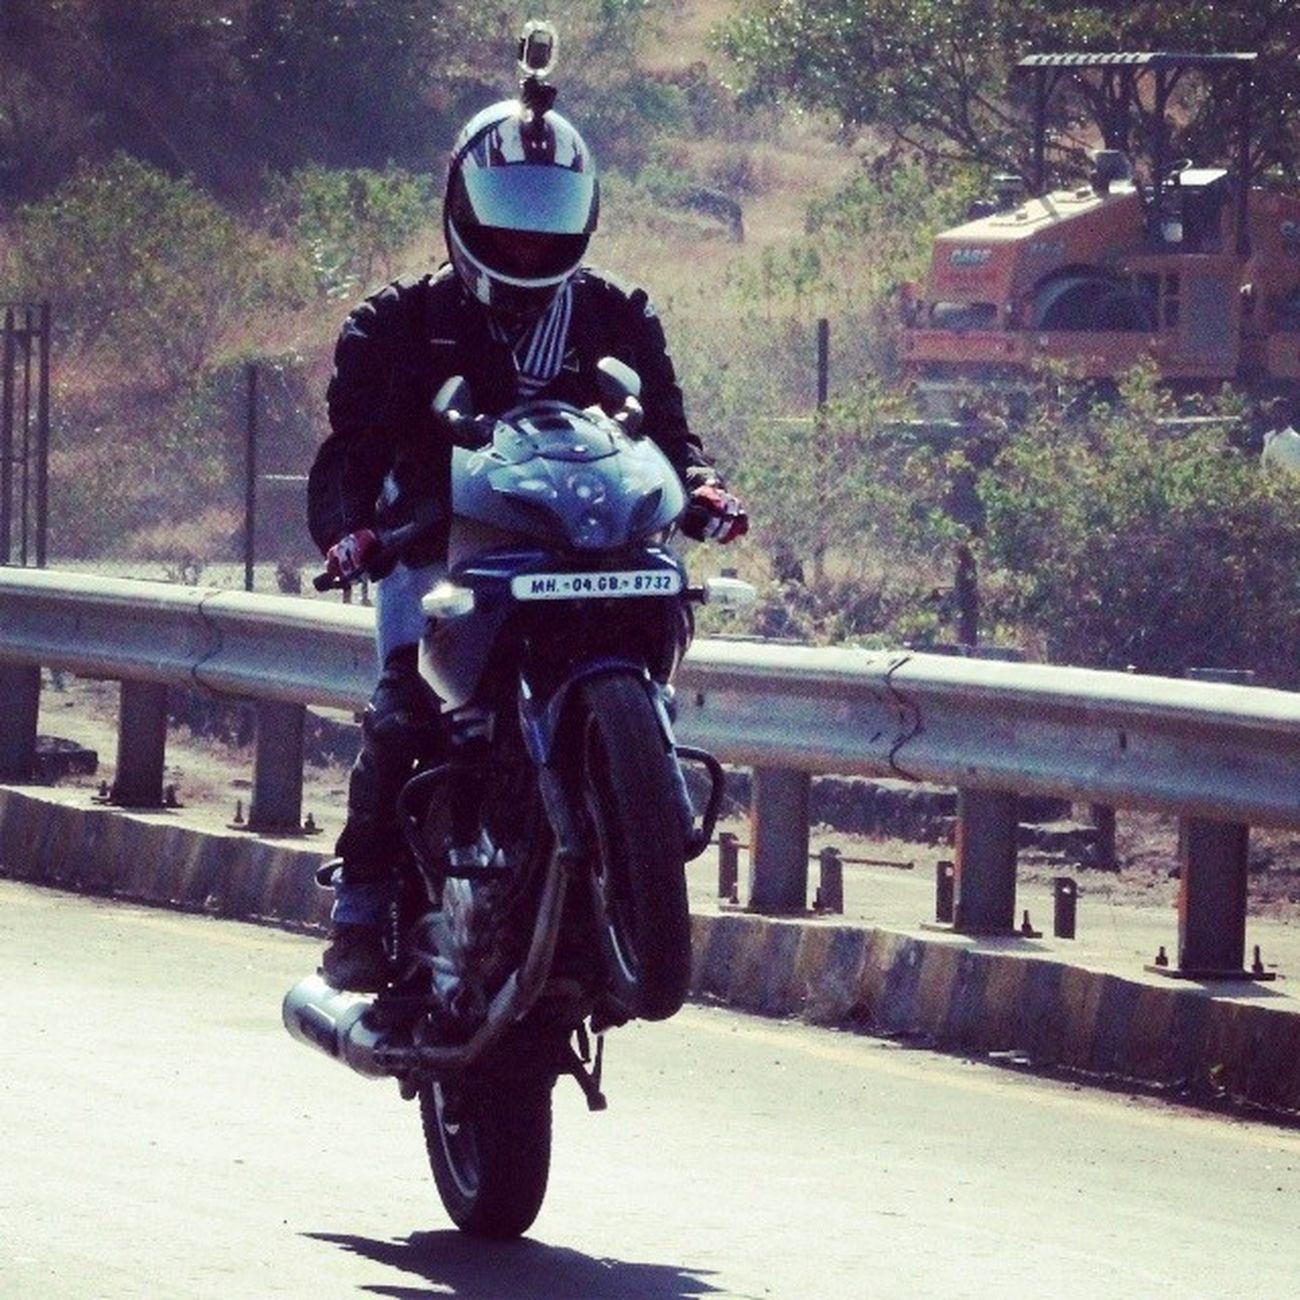 Live High... Touch The Sky.. ;) :P Pulsar220 Wheelie Lonavala Bike_riders_mumbai Anniversary Ride Bikerbuddies Riding Enjoying Memorable